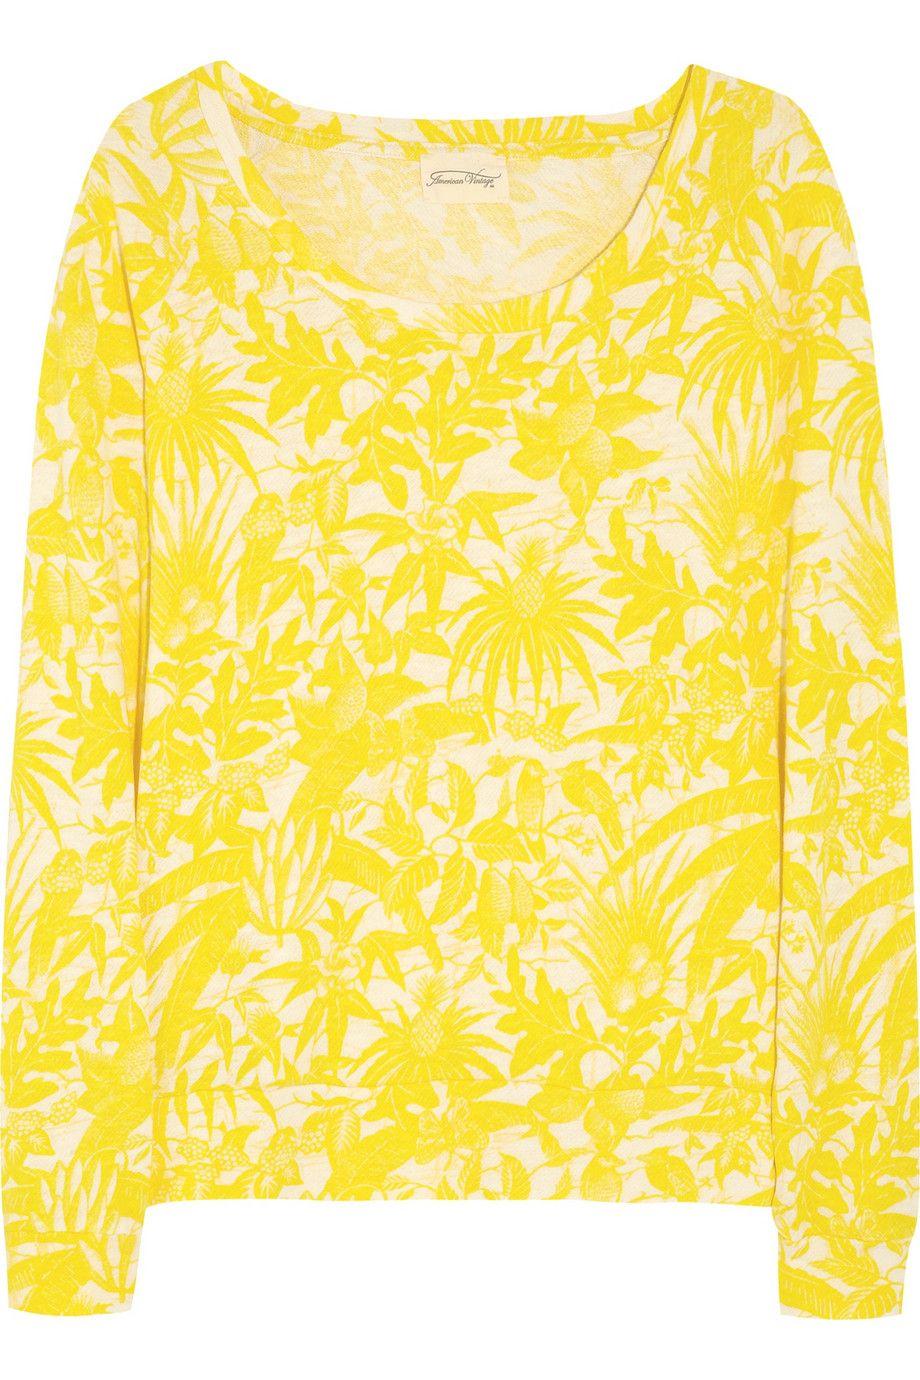 American VintageMusk printed cotton sweatshirt